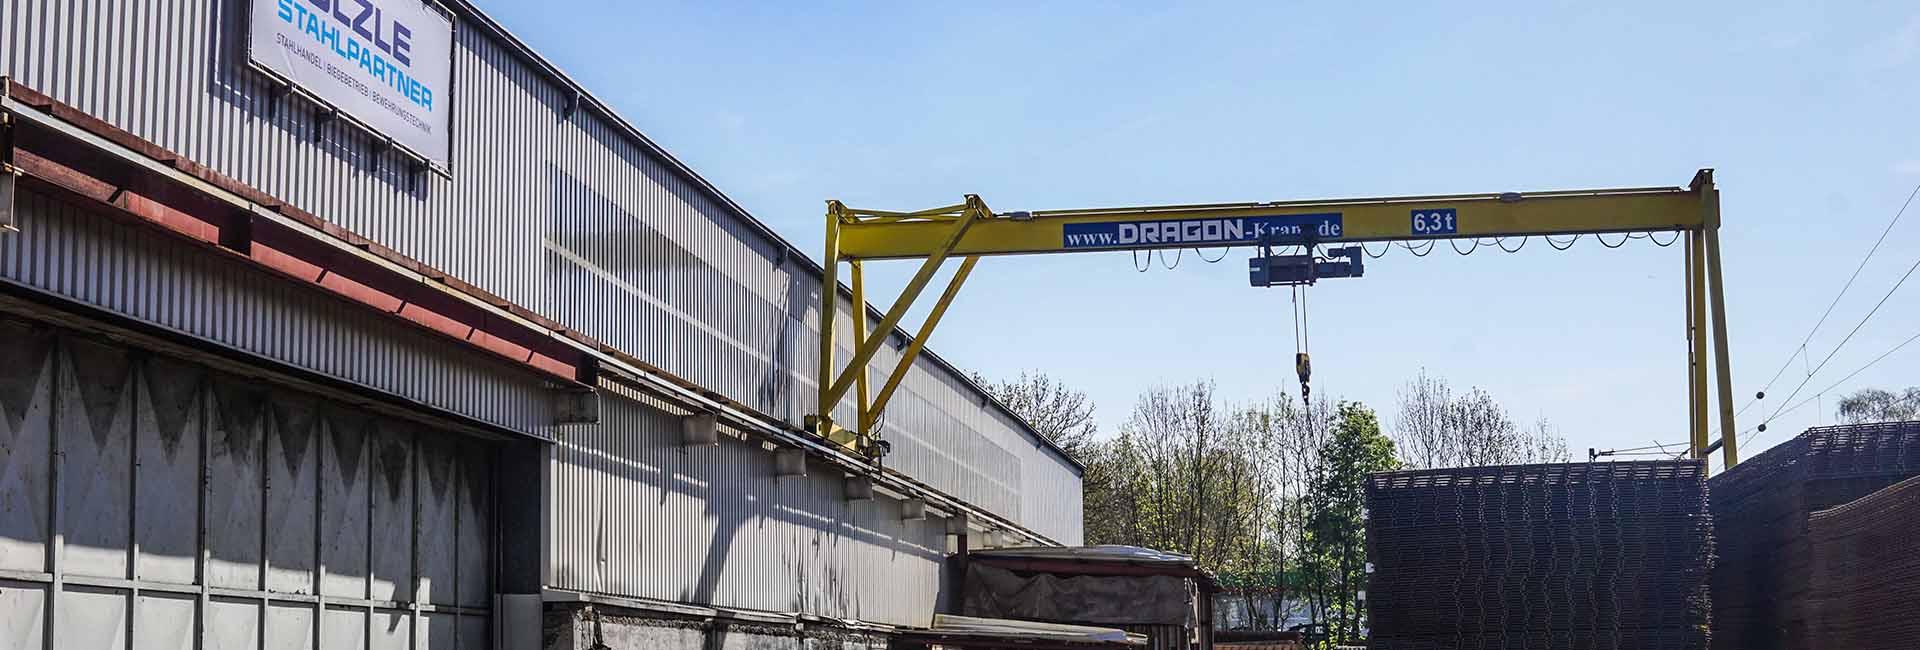 Die SÜLZLE Stahlpartner Niederlassung in Göppingen